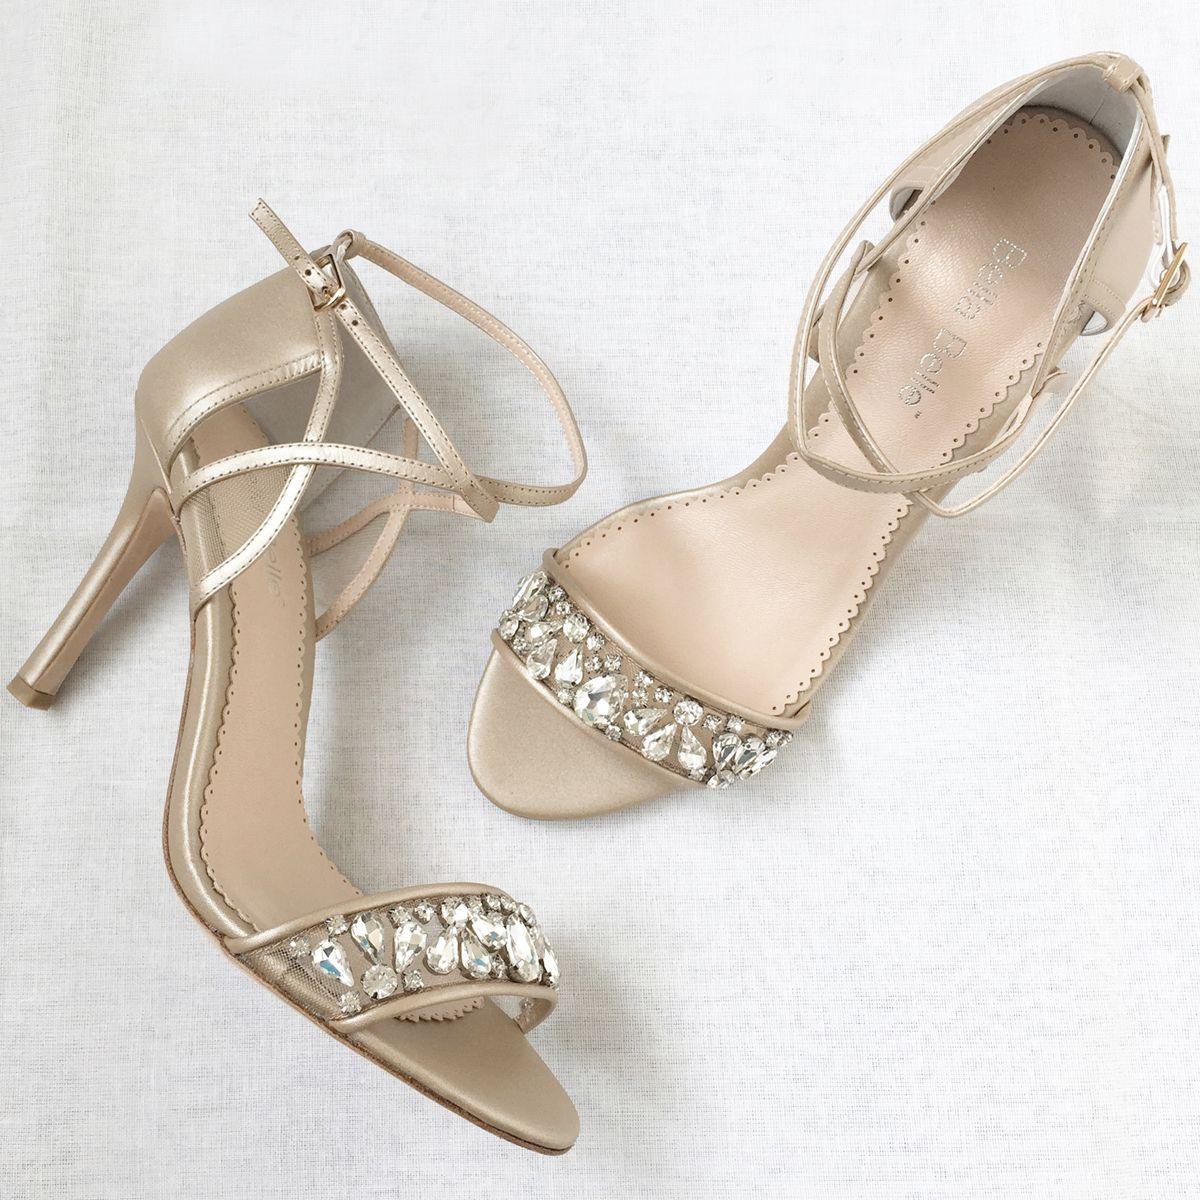 7dc5353059a6 Nude Jewel Toe Bridesmaid Shoes - Filipa